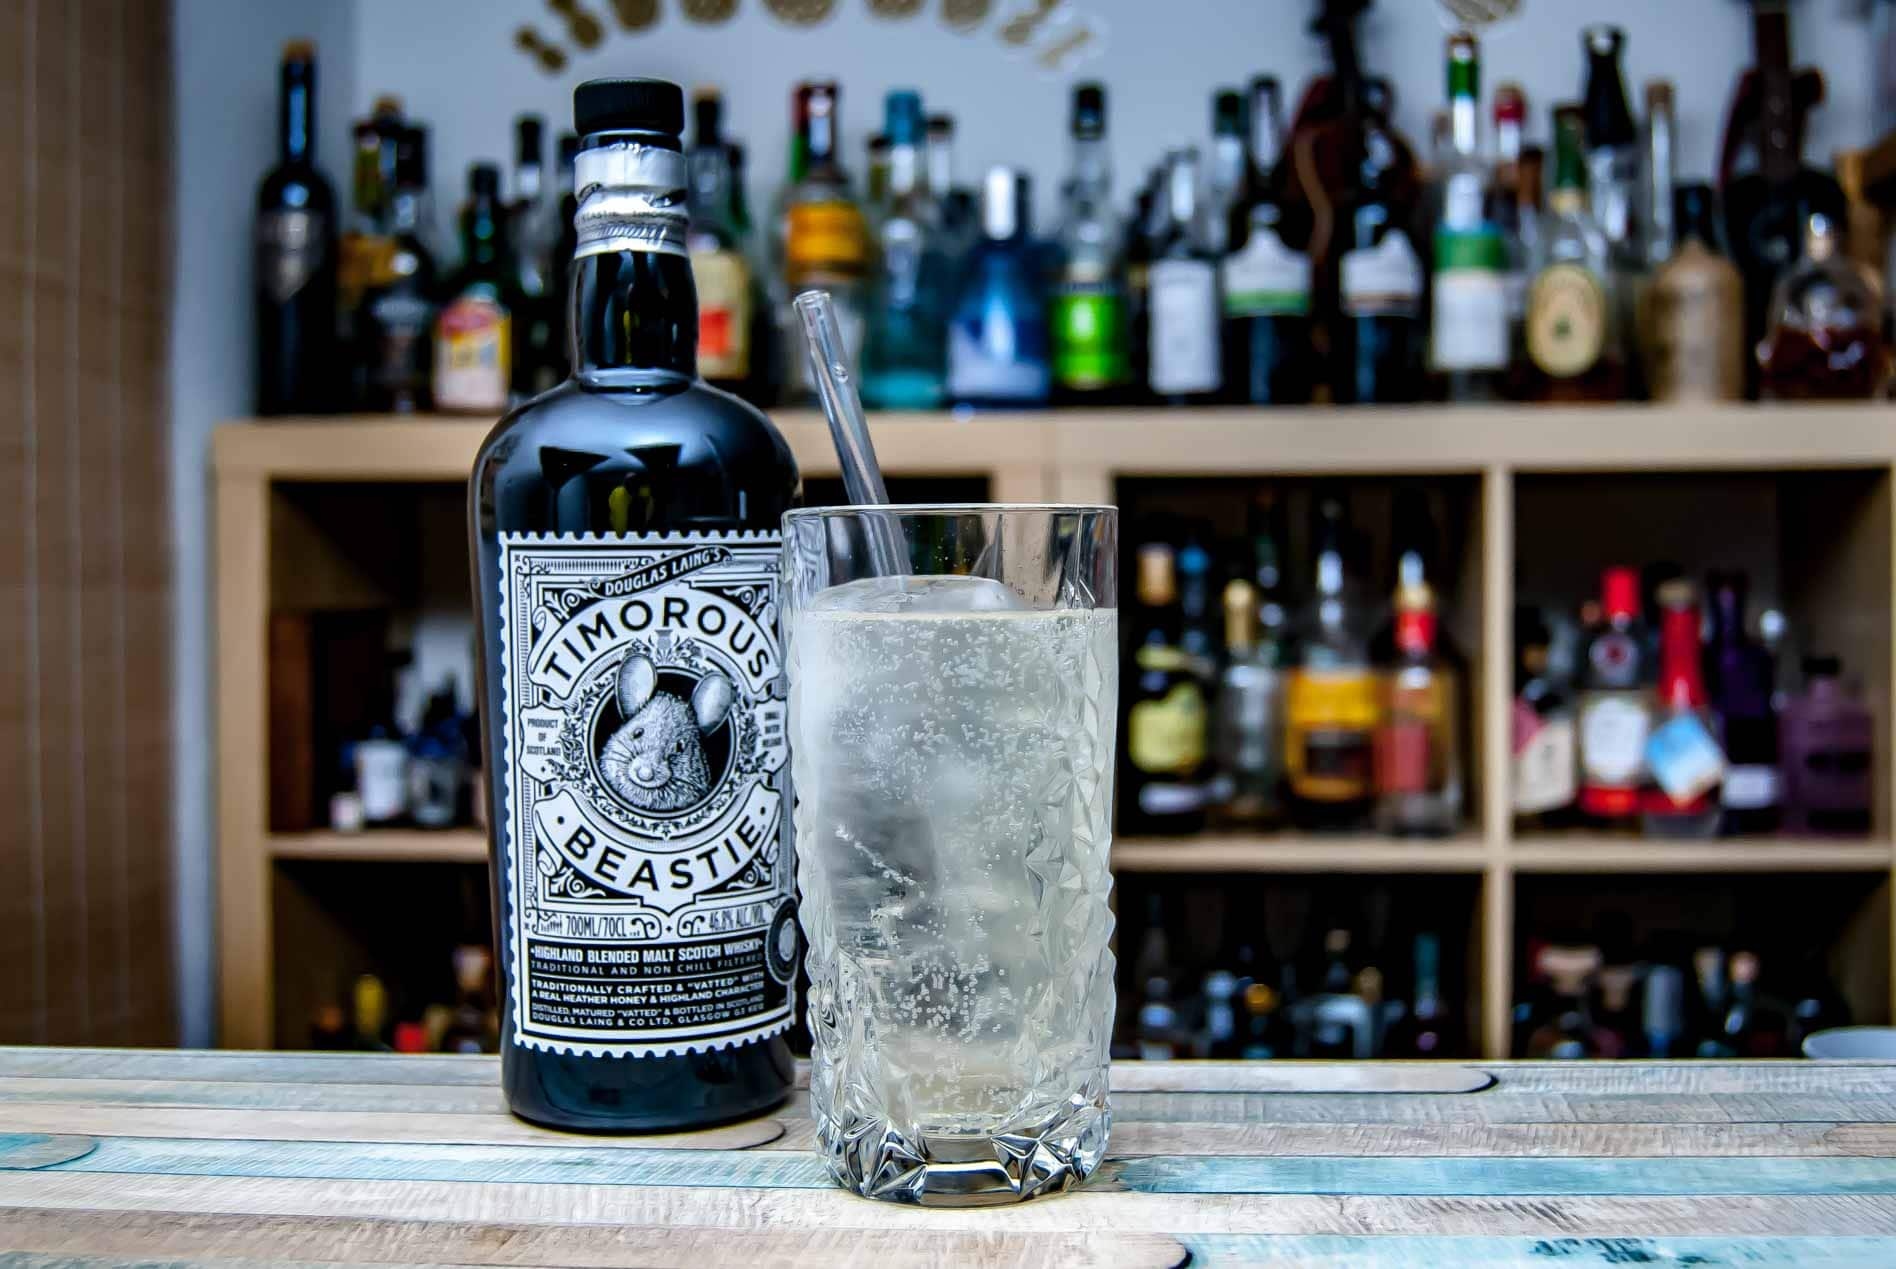 Timorous Beastie Blended Highland Scotch im Whisky Soda.